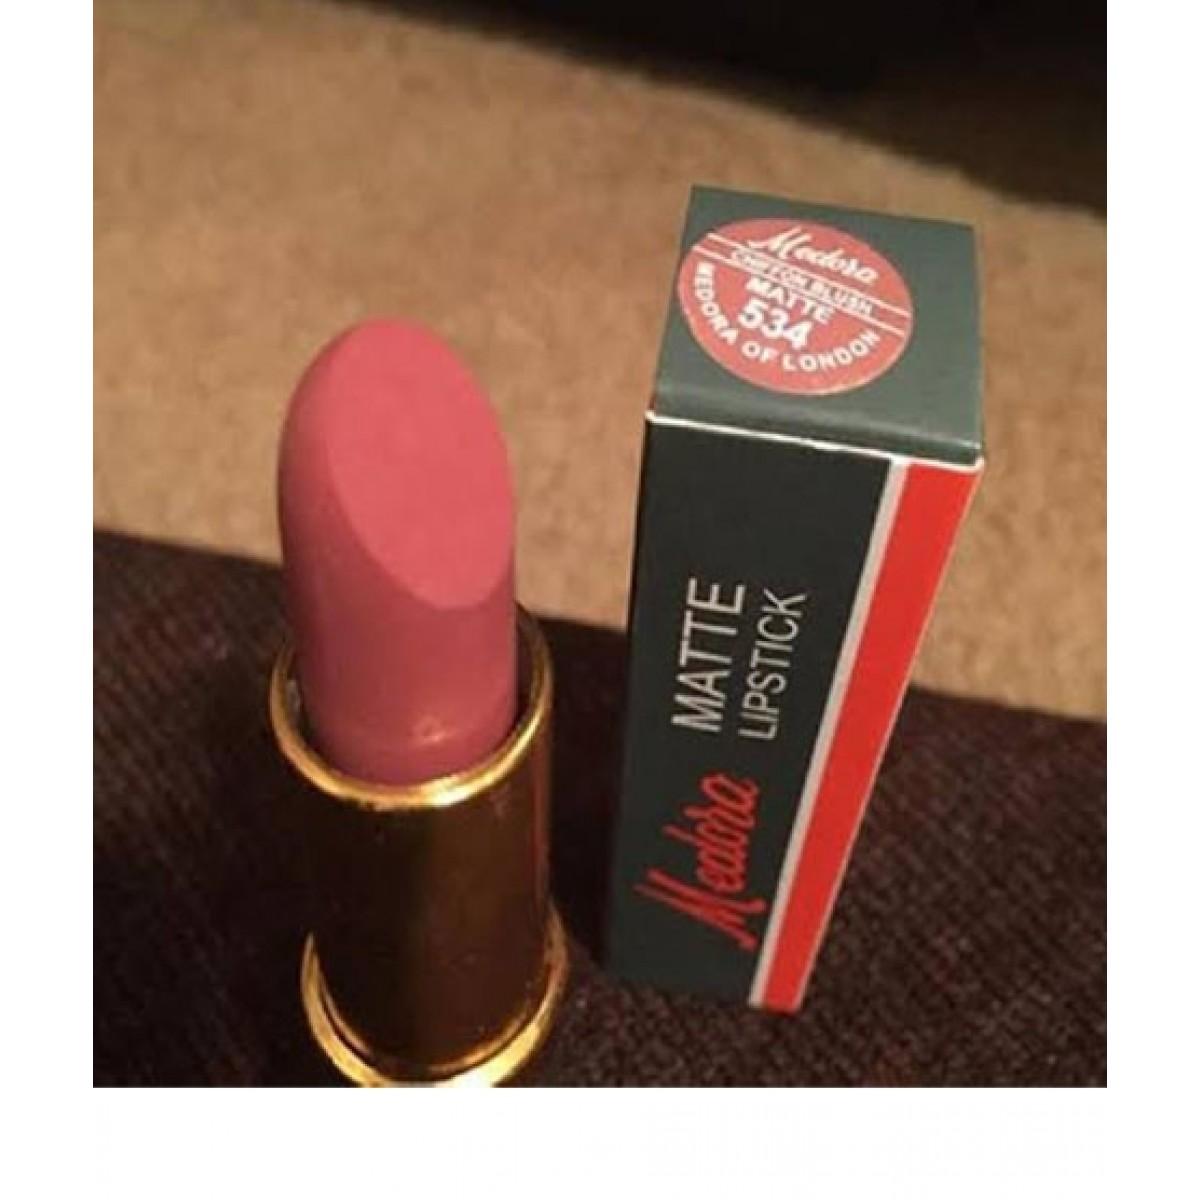 Medora Matte Lipstick Chiffon Blush Price In Pakistan Buy Medora Matte Lipstick 534 Ishopping Pk